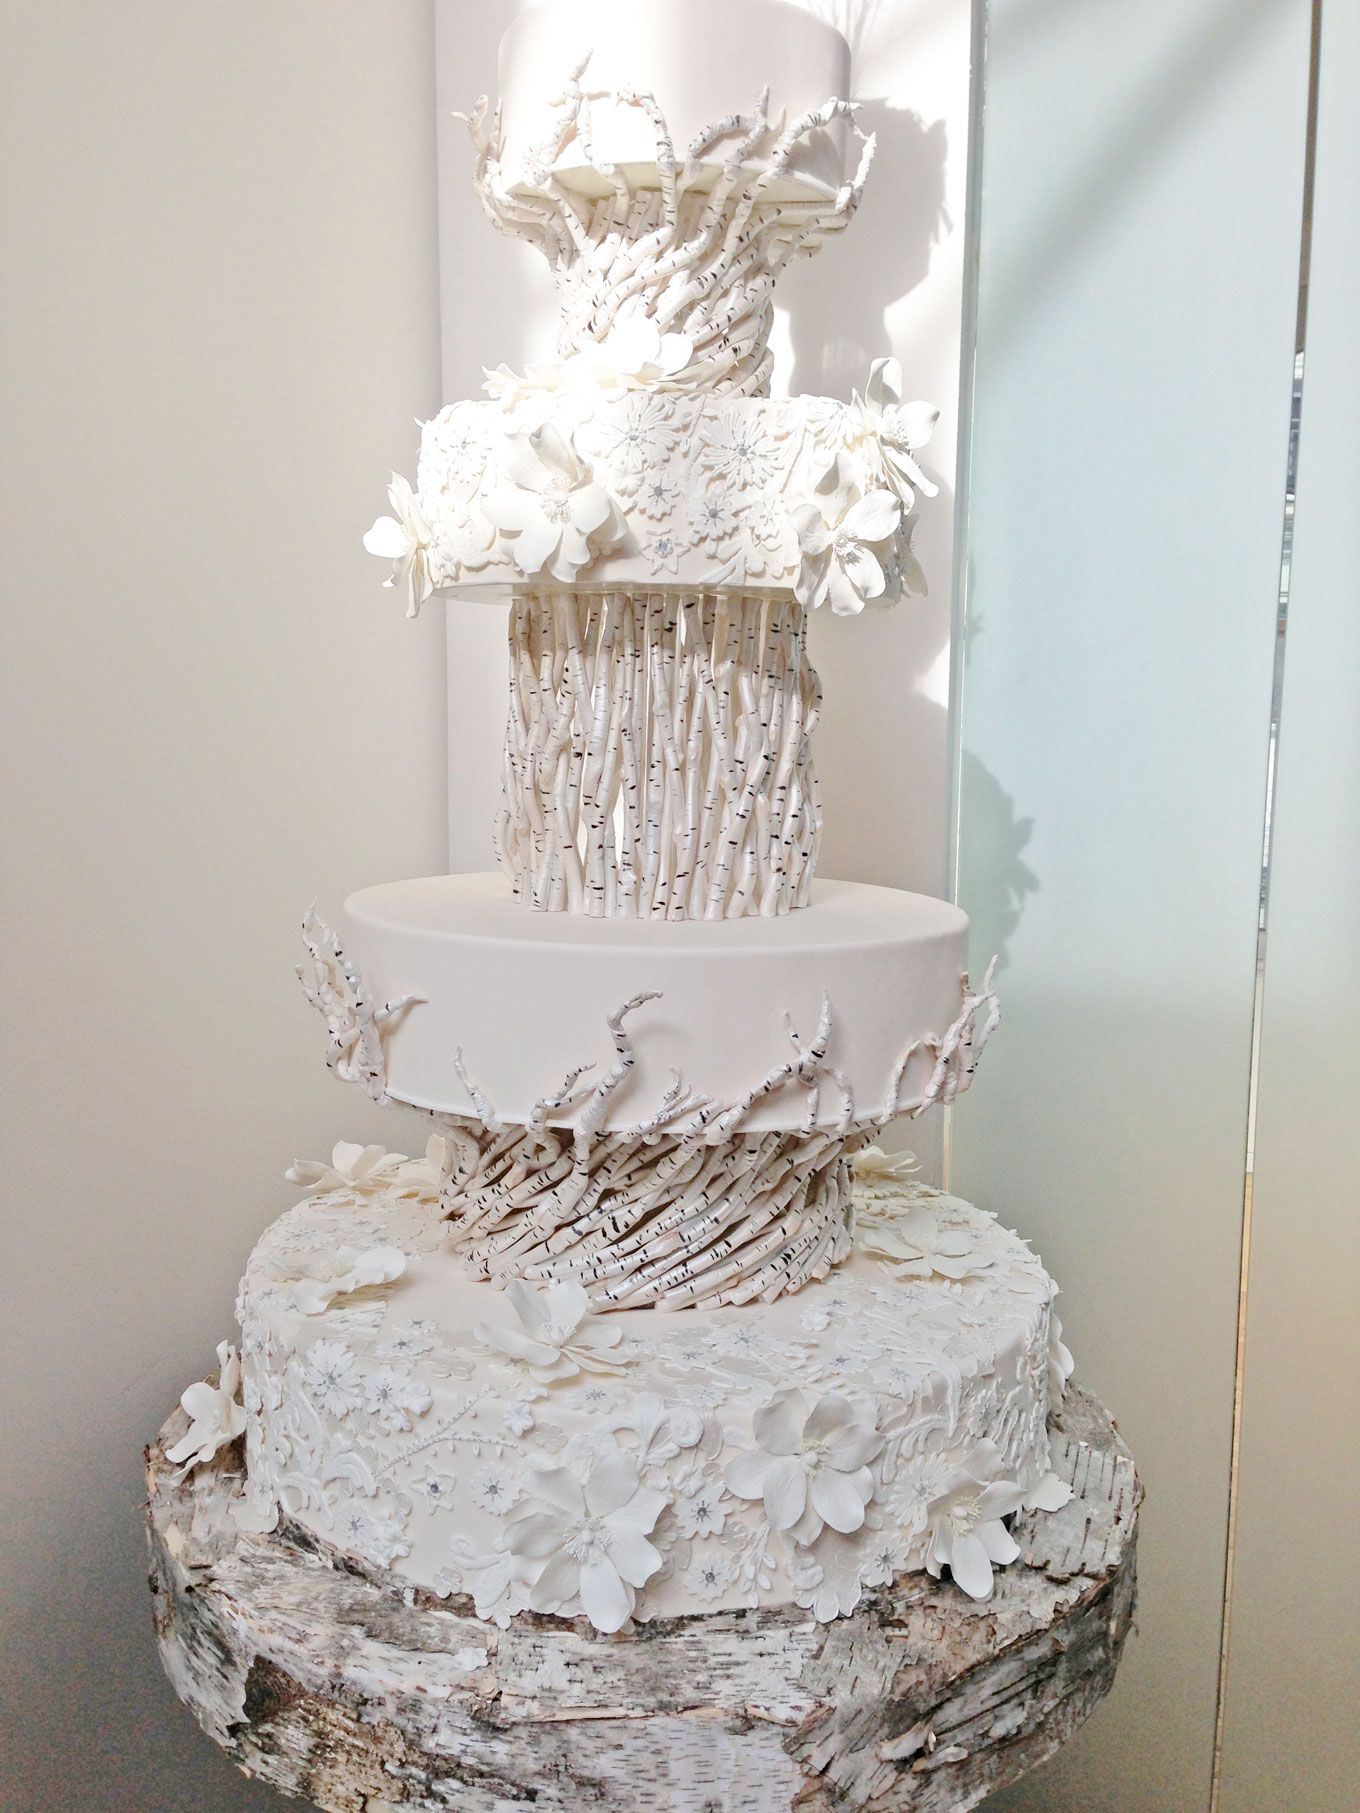 Ronbenisraelweddingcake13jpg 13601813 Wedding Cakes - Ben Israel Wedding Cakes